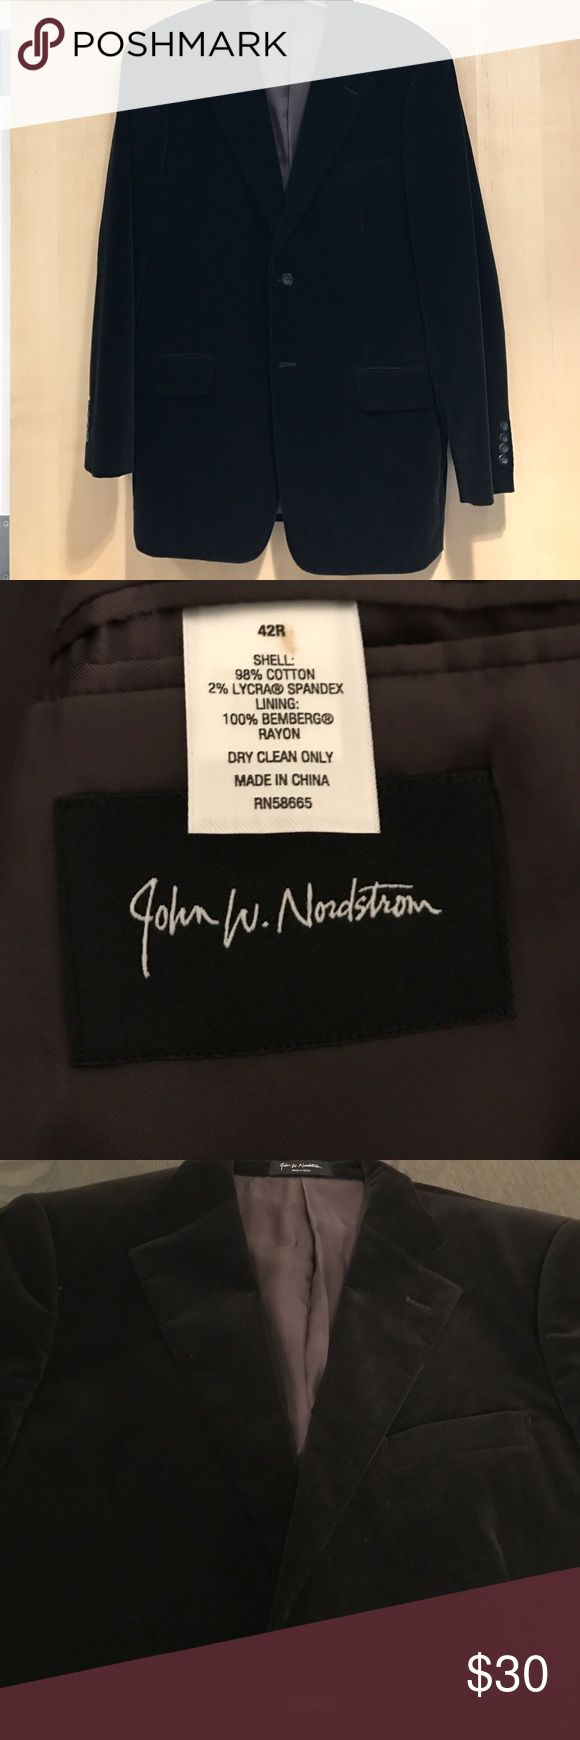 John Nordstrom Brown Corduroy Sports Coat size 42R Great Condition! John Nordstrom Suits & Blazers Sport Coats & Blazers